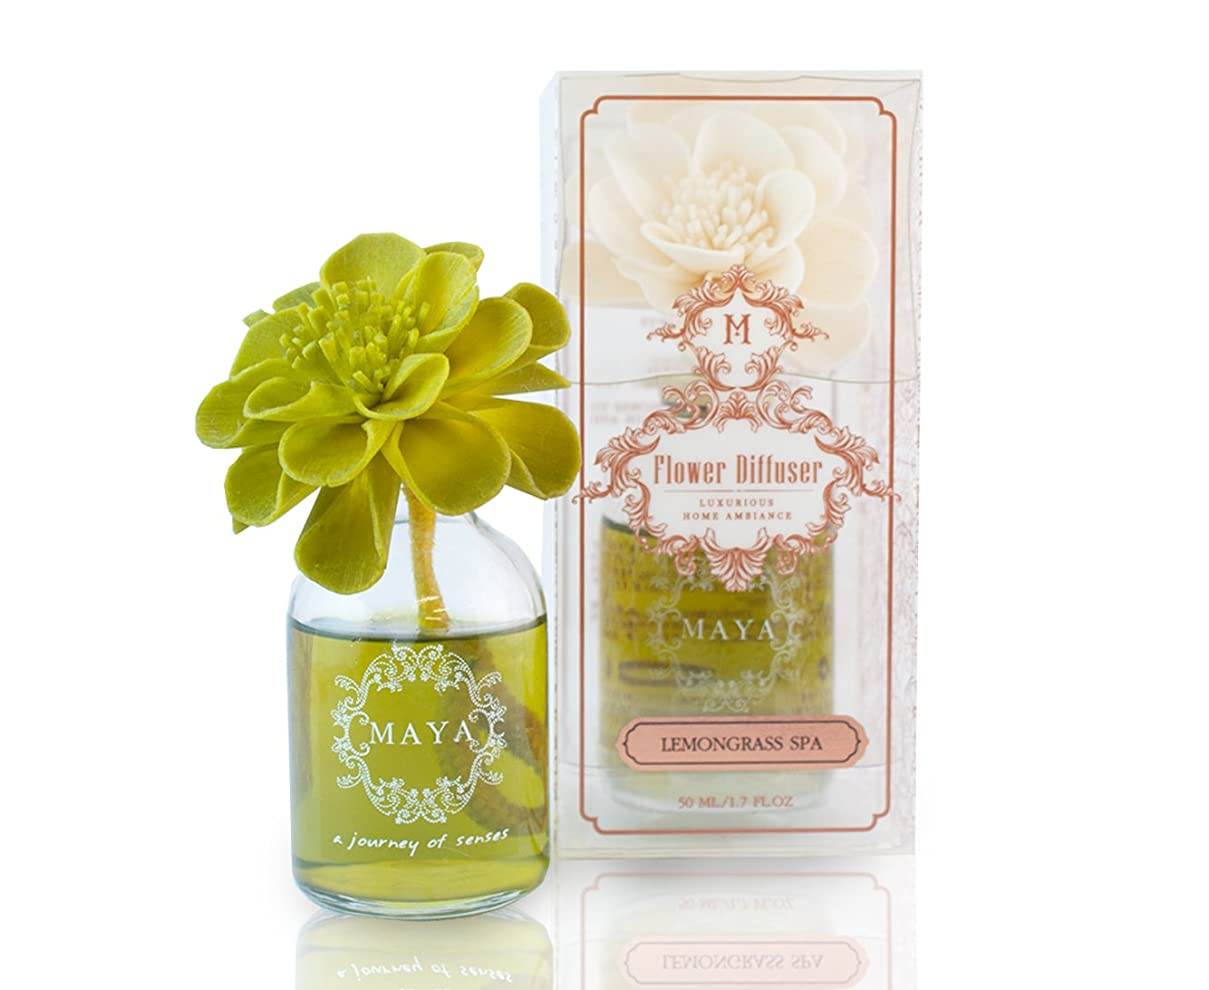 MAYA フラワーディフューザー レモングラススパ 50ml [並行輸入品] |Aroma Flower Diffuser - Lemongrass Spa 50ml